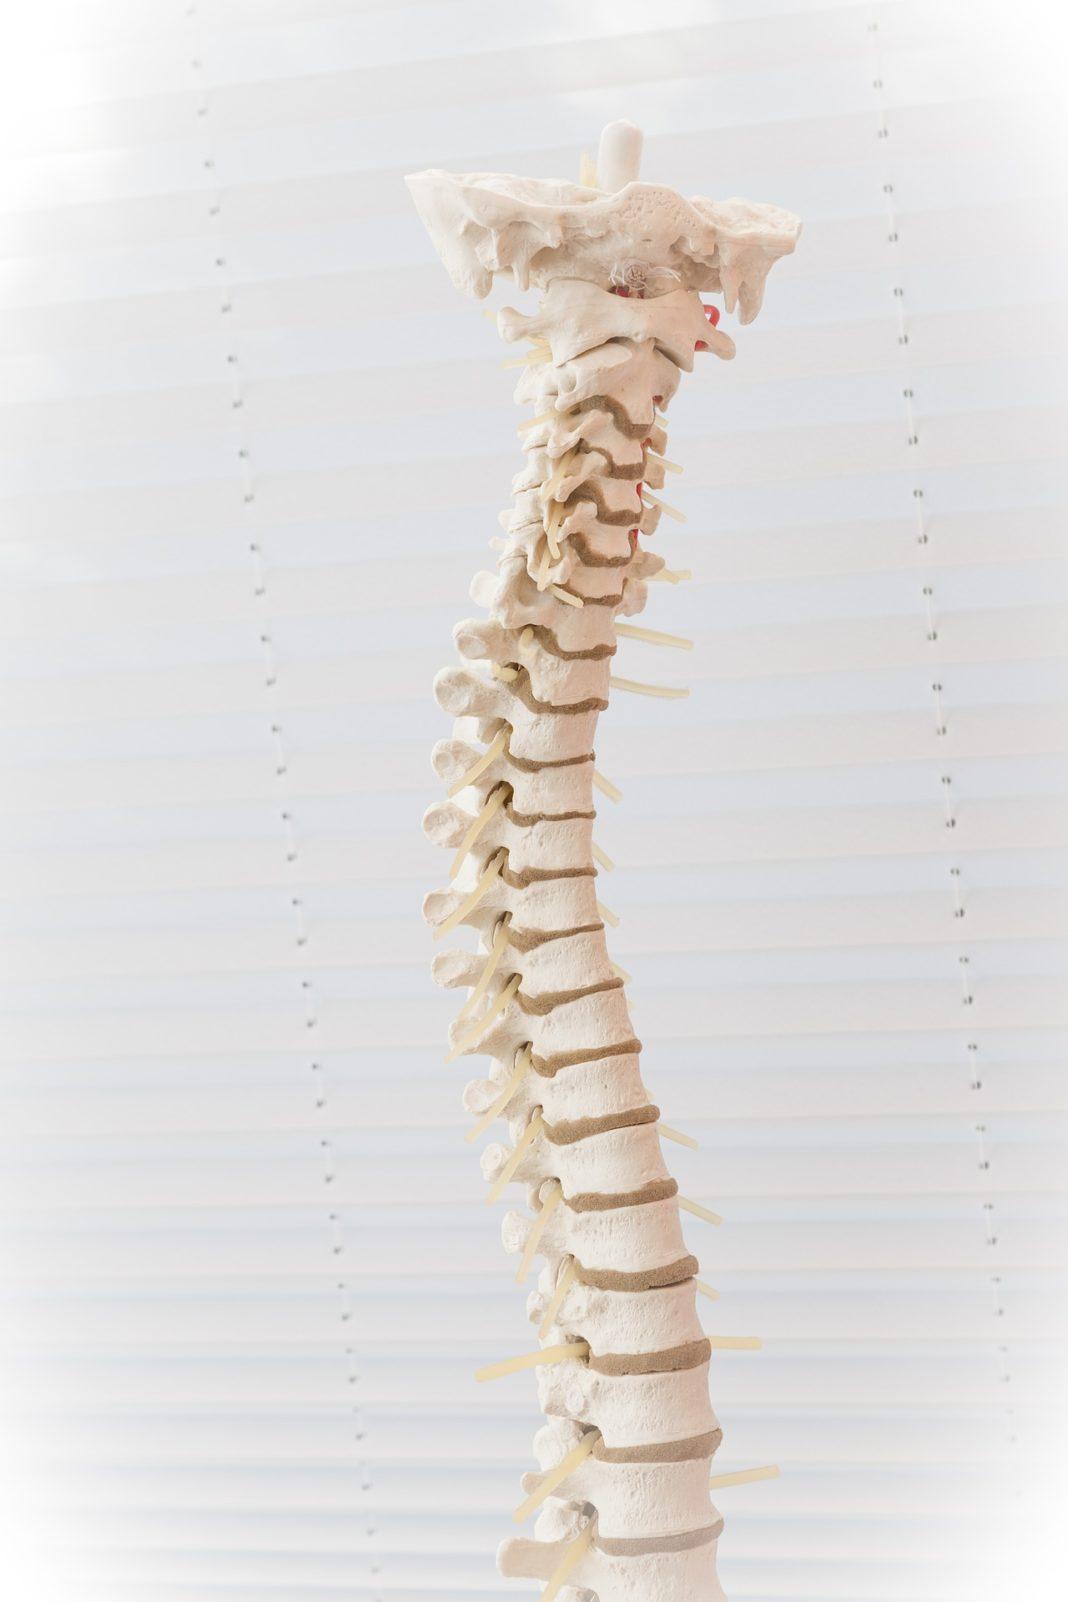 Cómo afecta una hernia discal